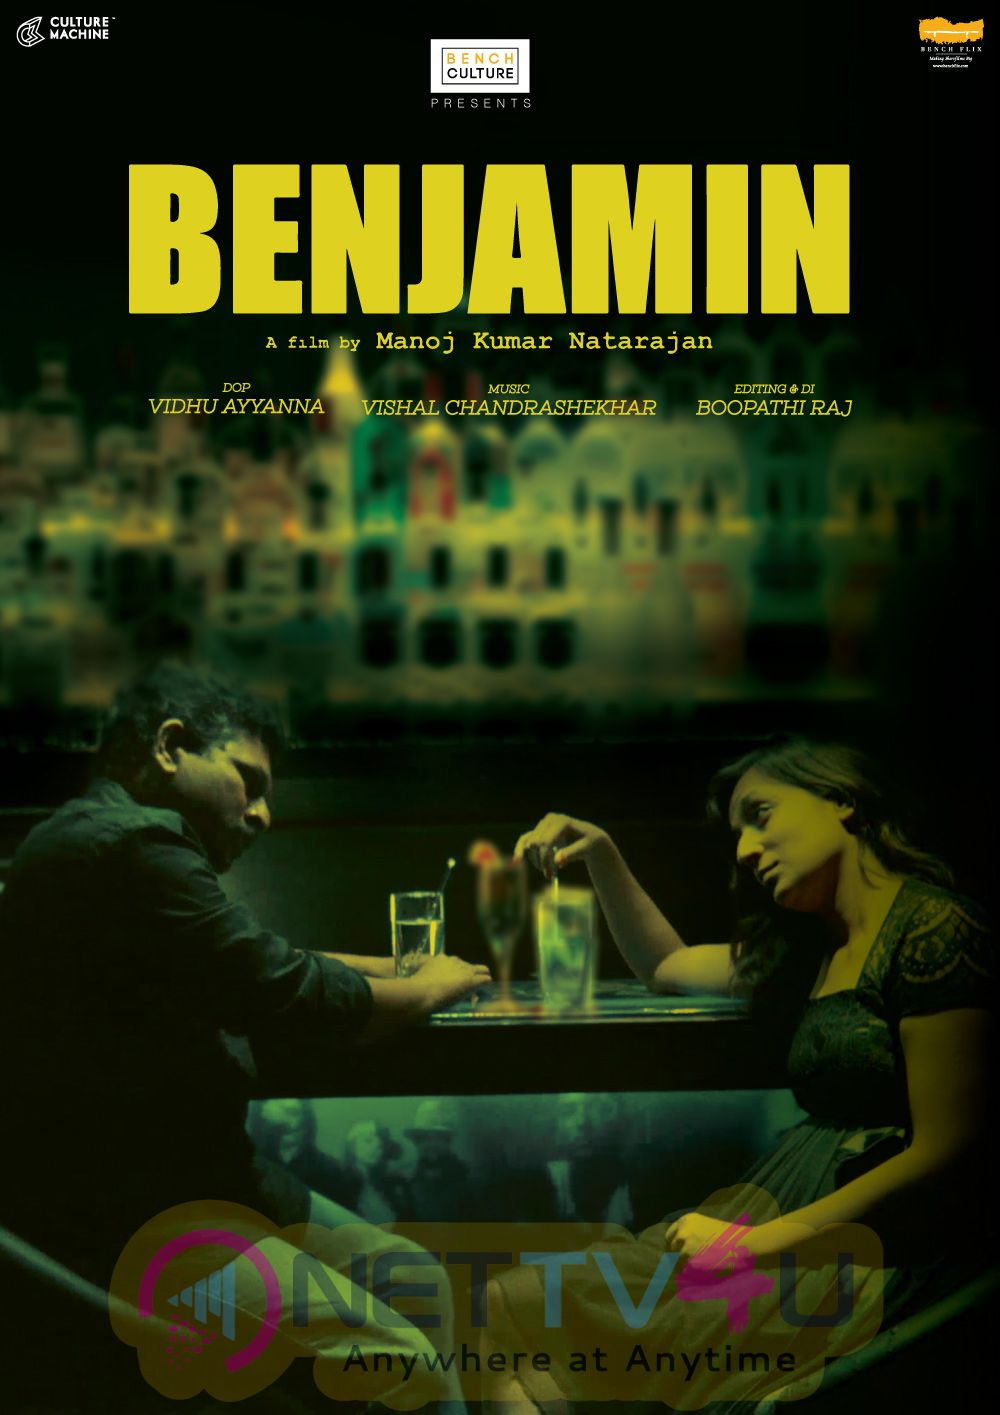 Bench Culture Releases Benjamin Tamil Movie Stills